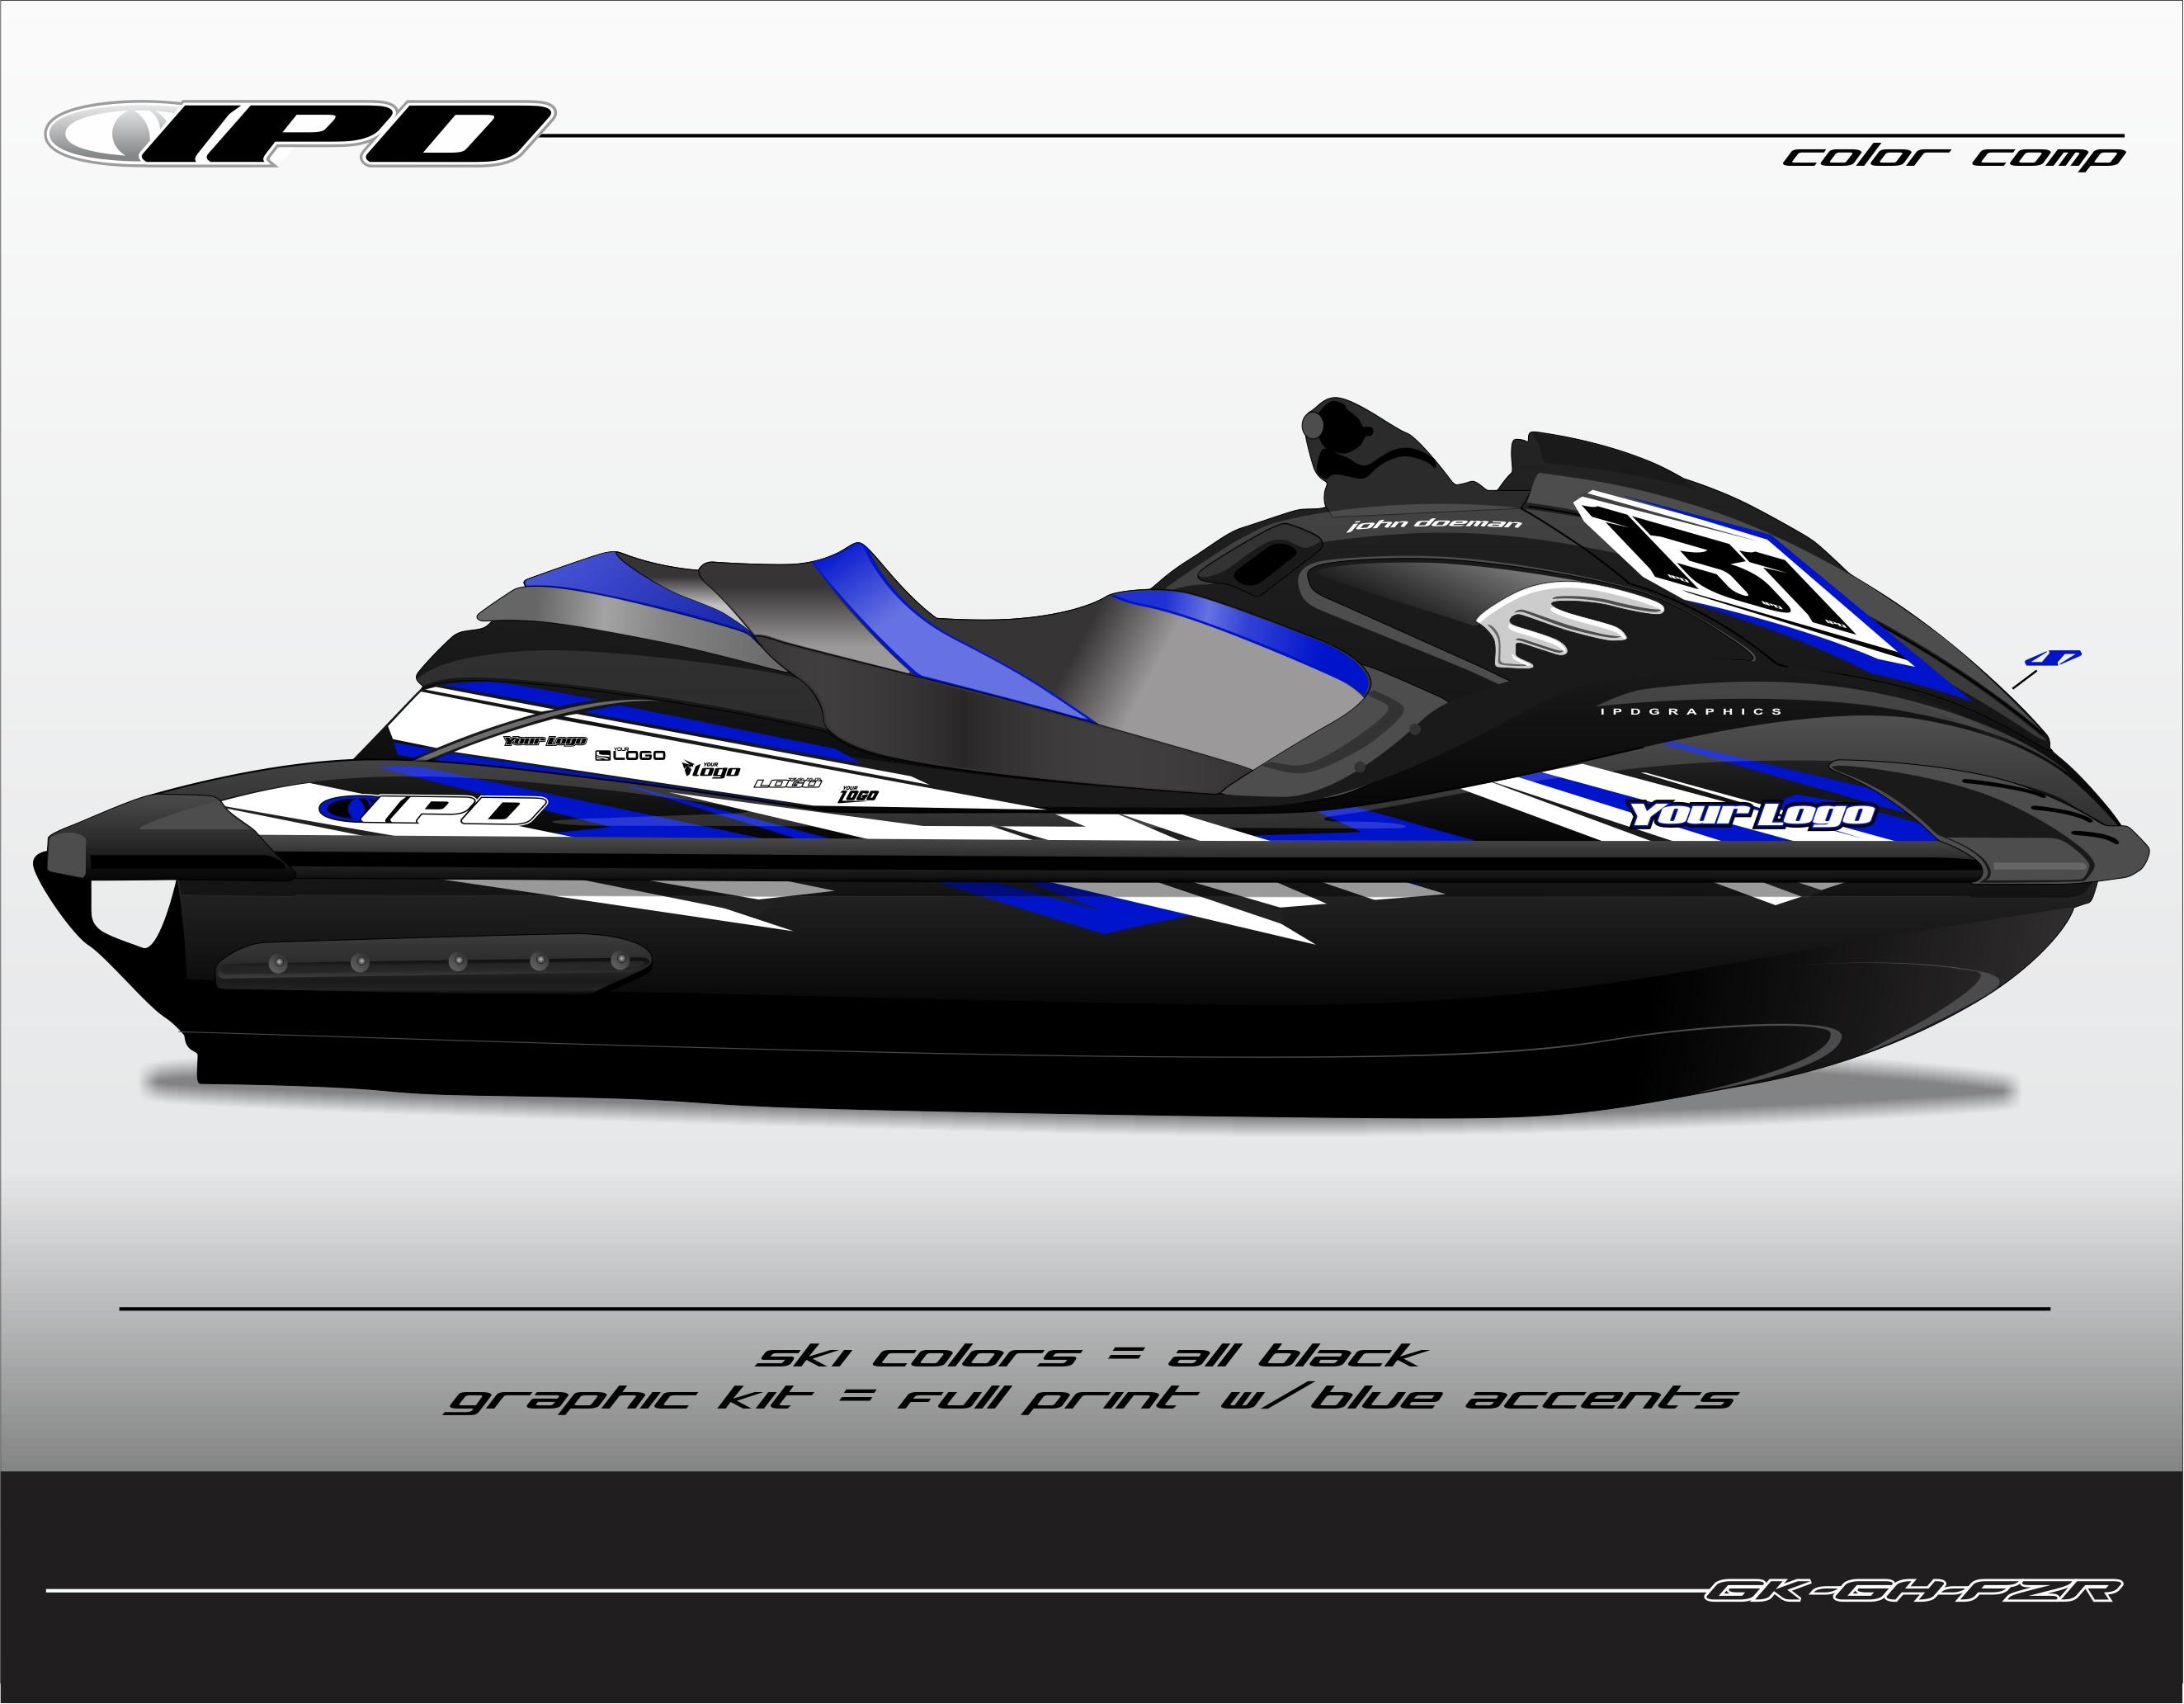 yamaha fzs fzr graphics kit gh design ipd jet ski graphics. Black Bedroom Furniture Sets. Home Design Ideas